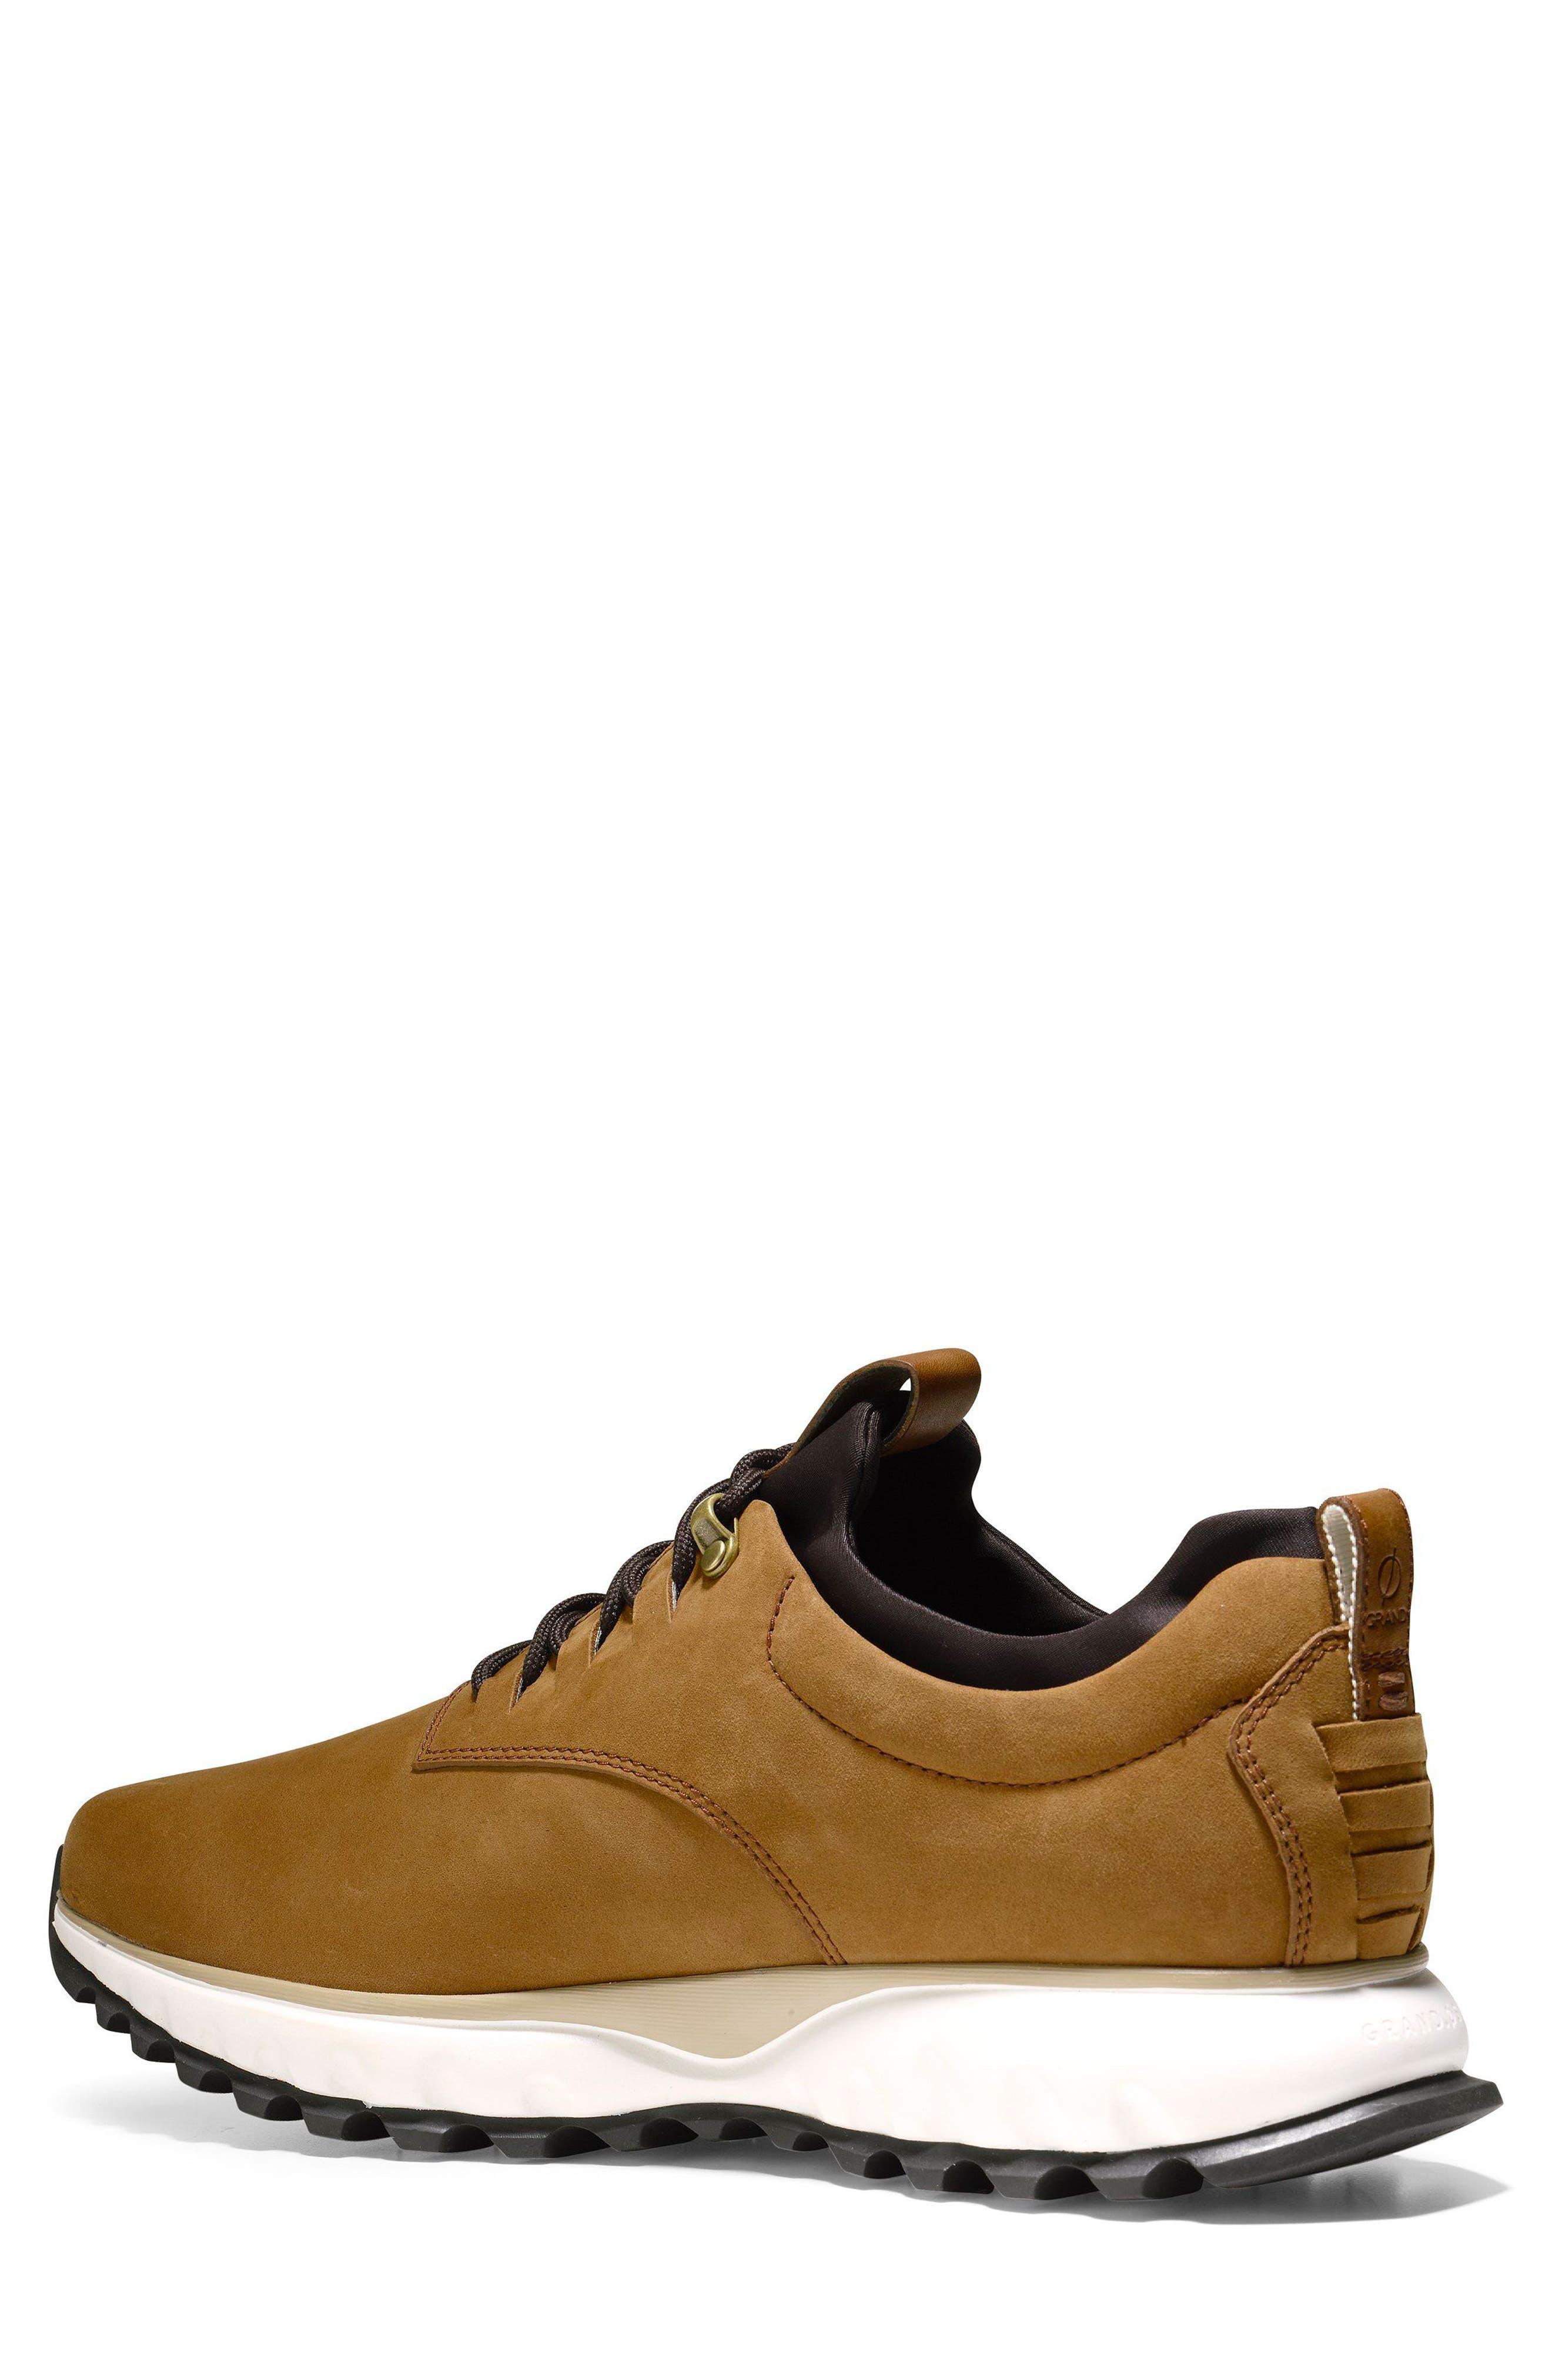 GrandExpløre All Terrain Waterproof Sneaker,                             Alternate thumbnail 2, color,